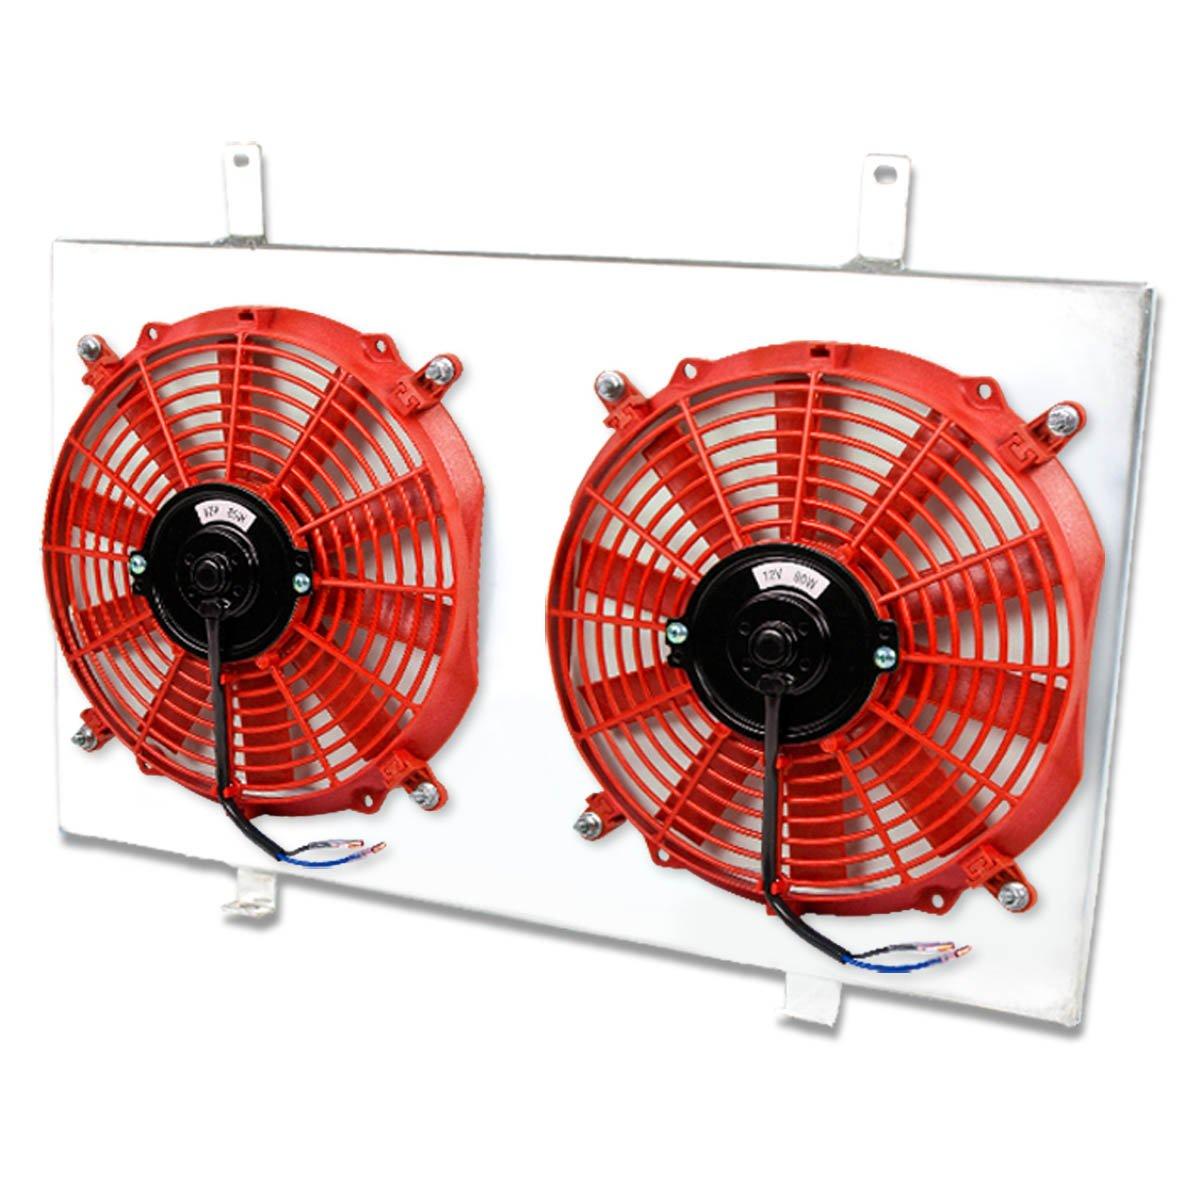 For Nissan Maxima/Infiniti I30 MT Aluminum Bolt-on Cooling Radiator Fan Shroud (Red) - 4th Gen A32 VQ30